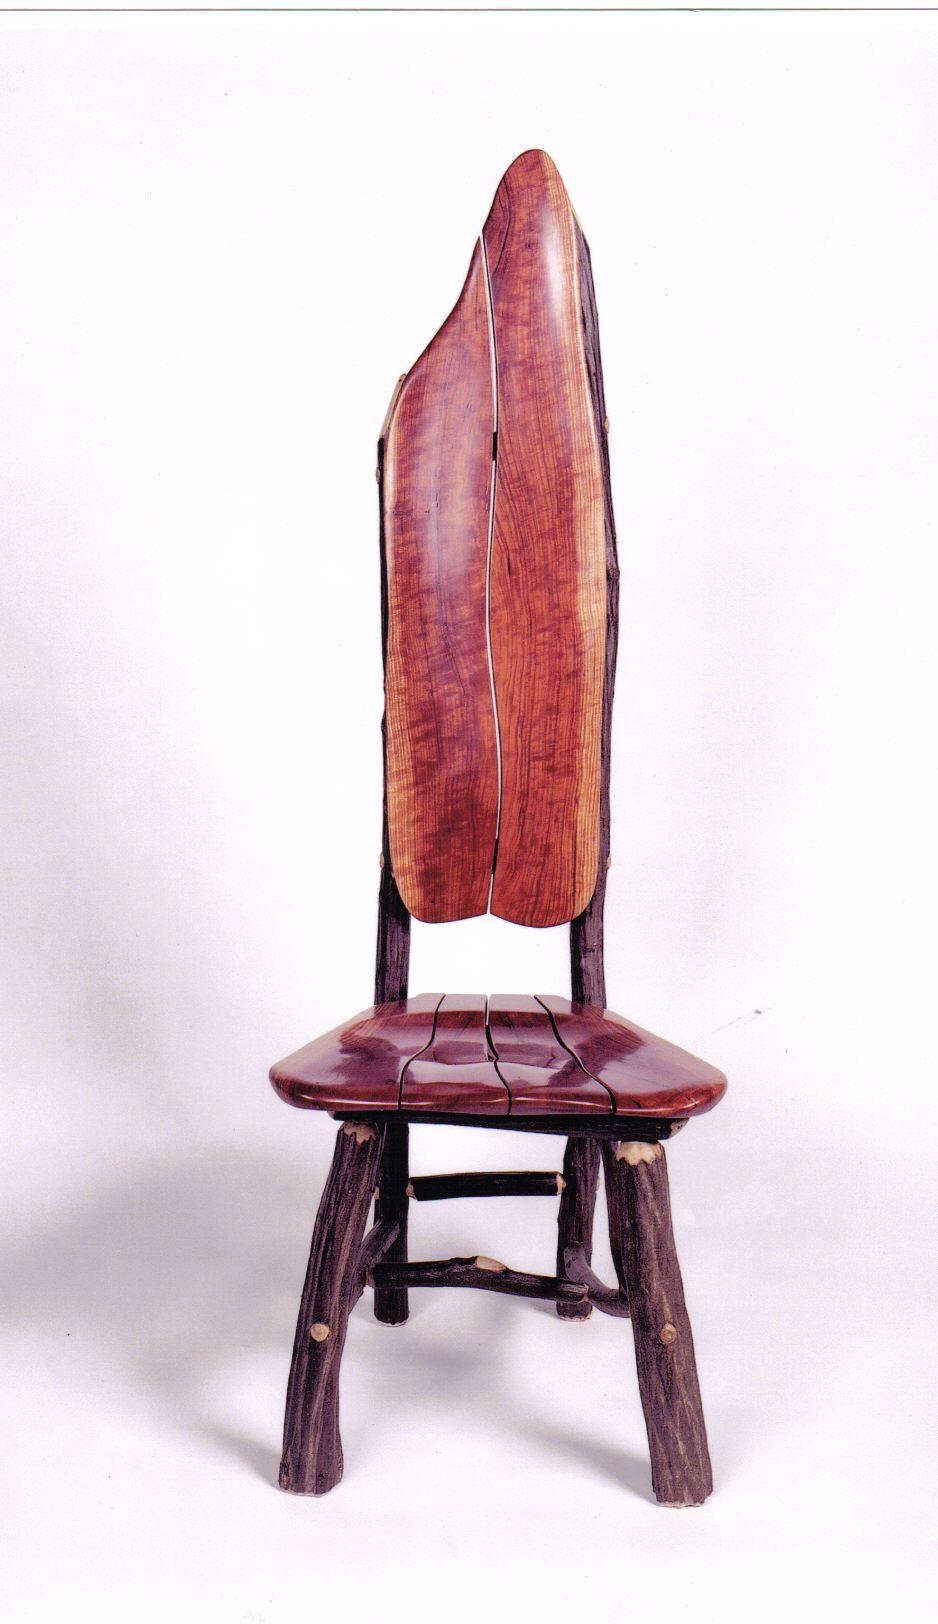 Reid Crosby Chair Rustic Furniture Rustic Rustic Decor [ 1624 x 938 Pixel ]